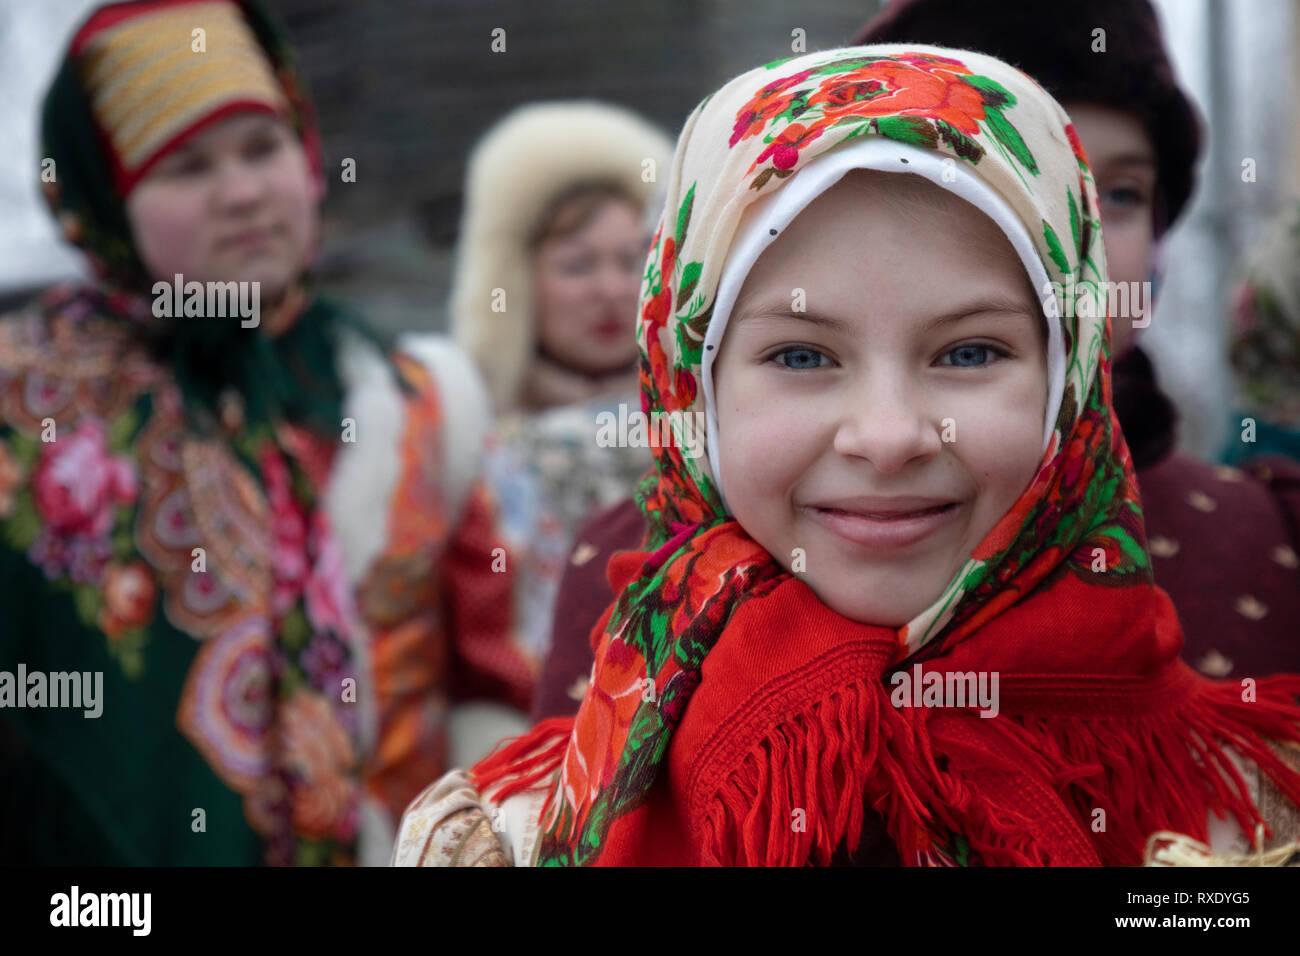 Russian nudist teens